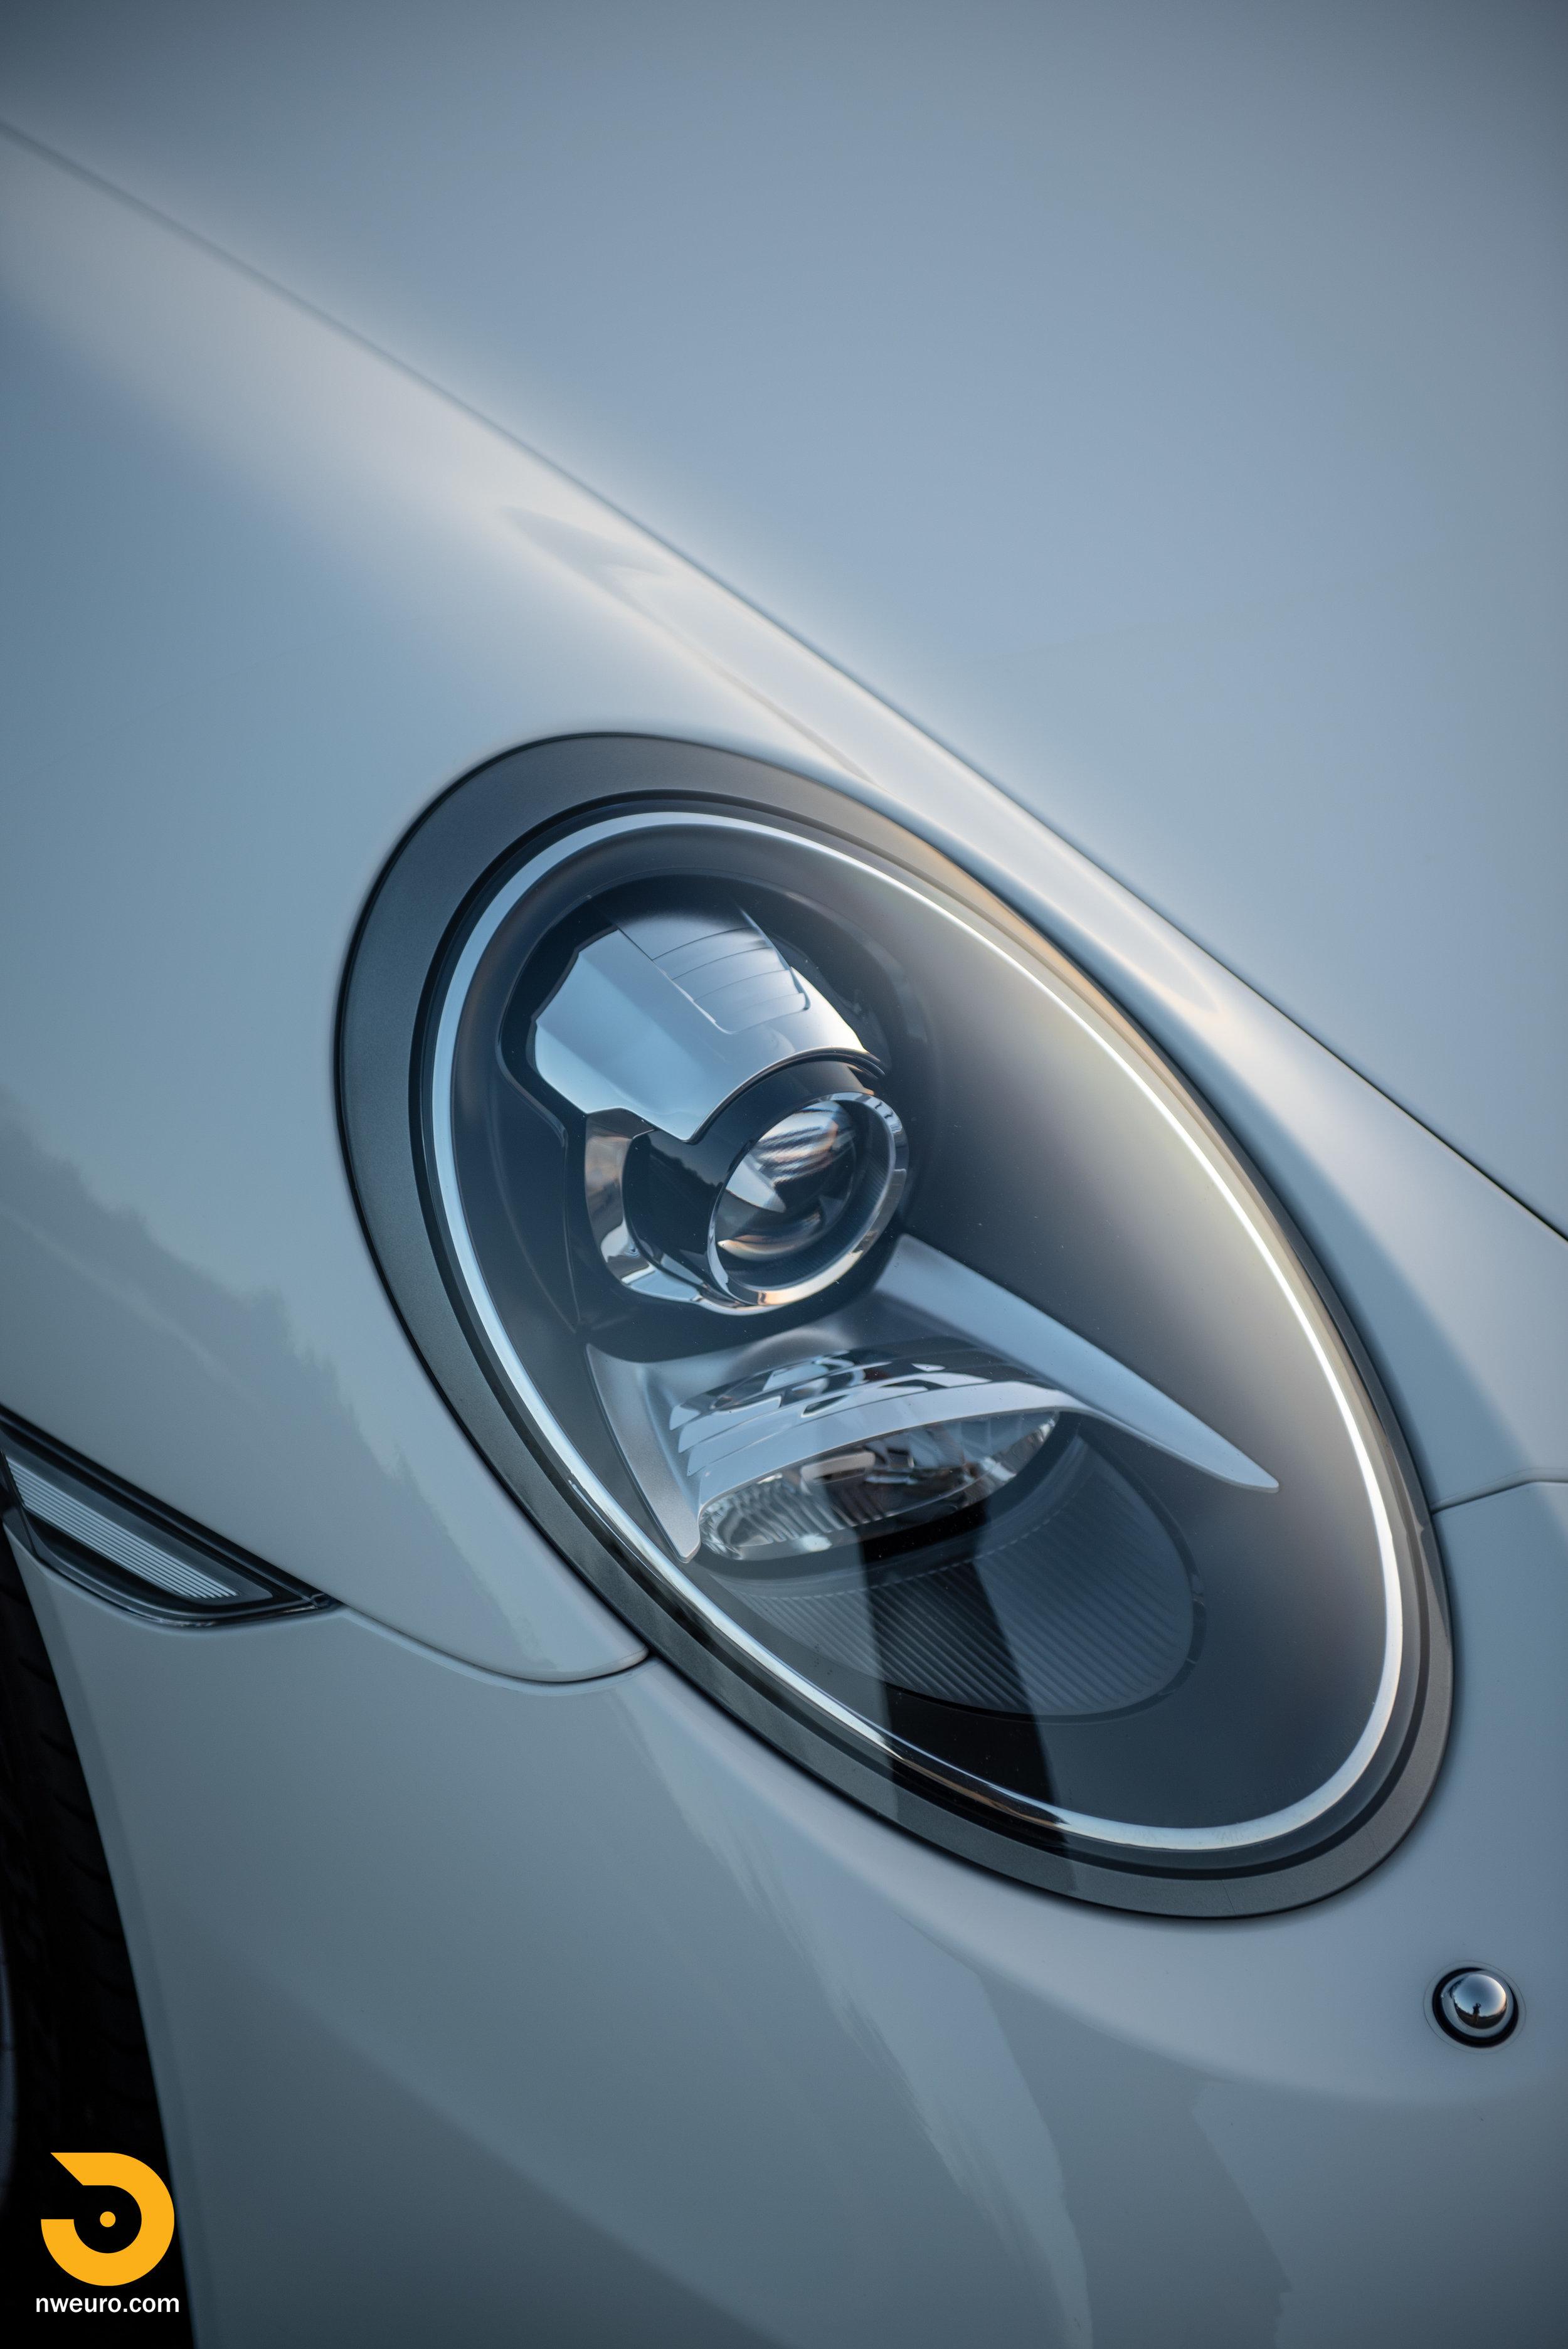 2012 Porsche Carrera S-59.jpg